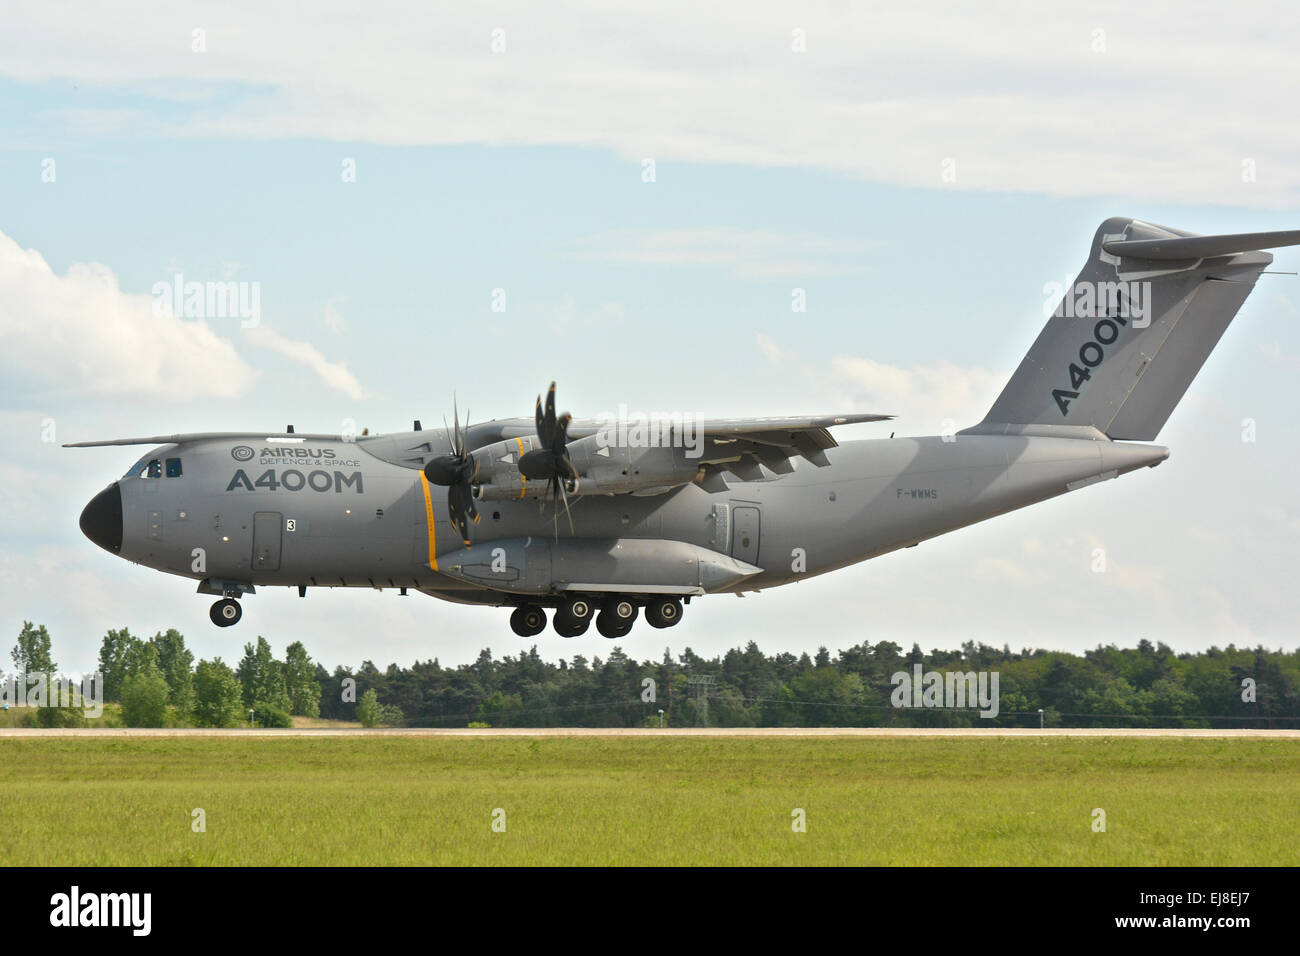 Airbus A400 M ILA Berlin 2014 - Stock Image